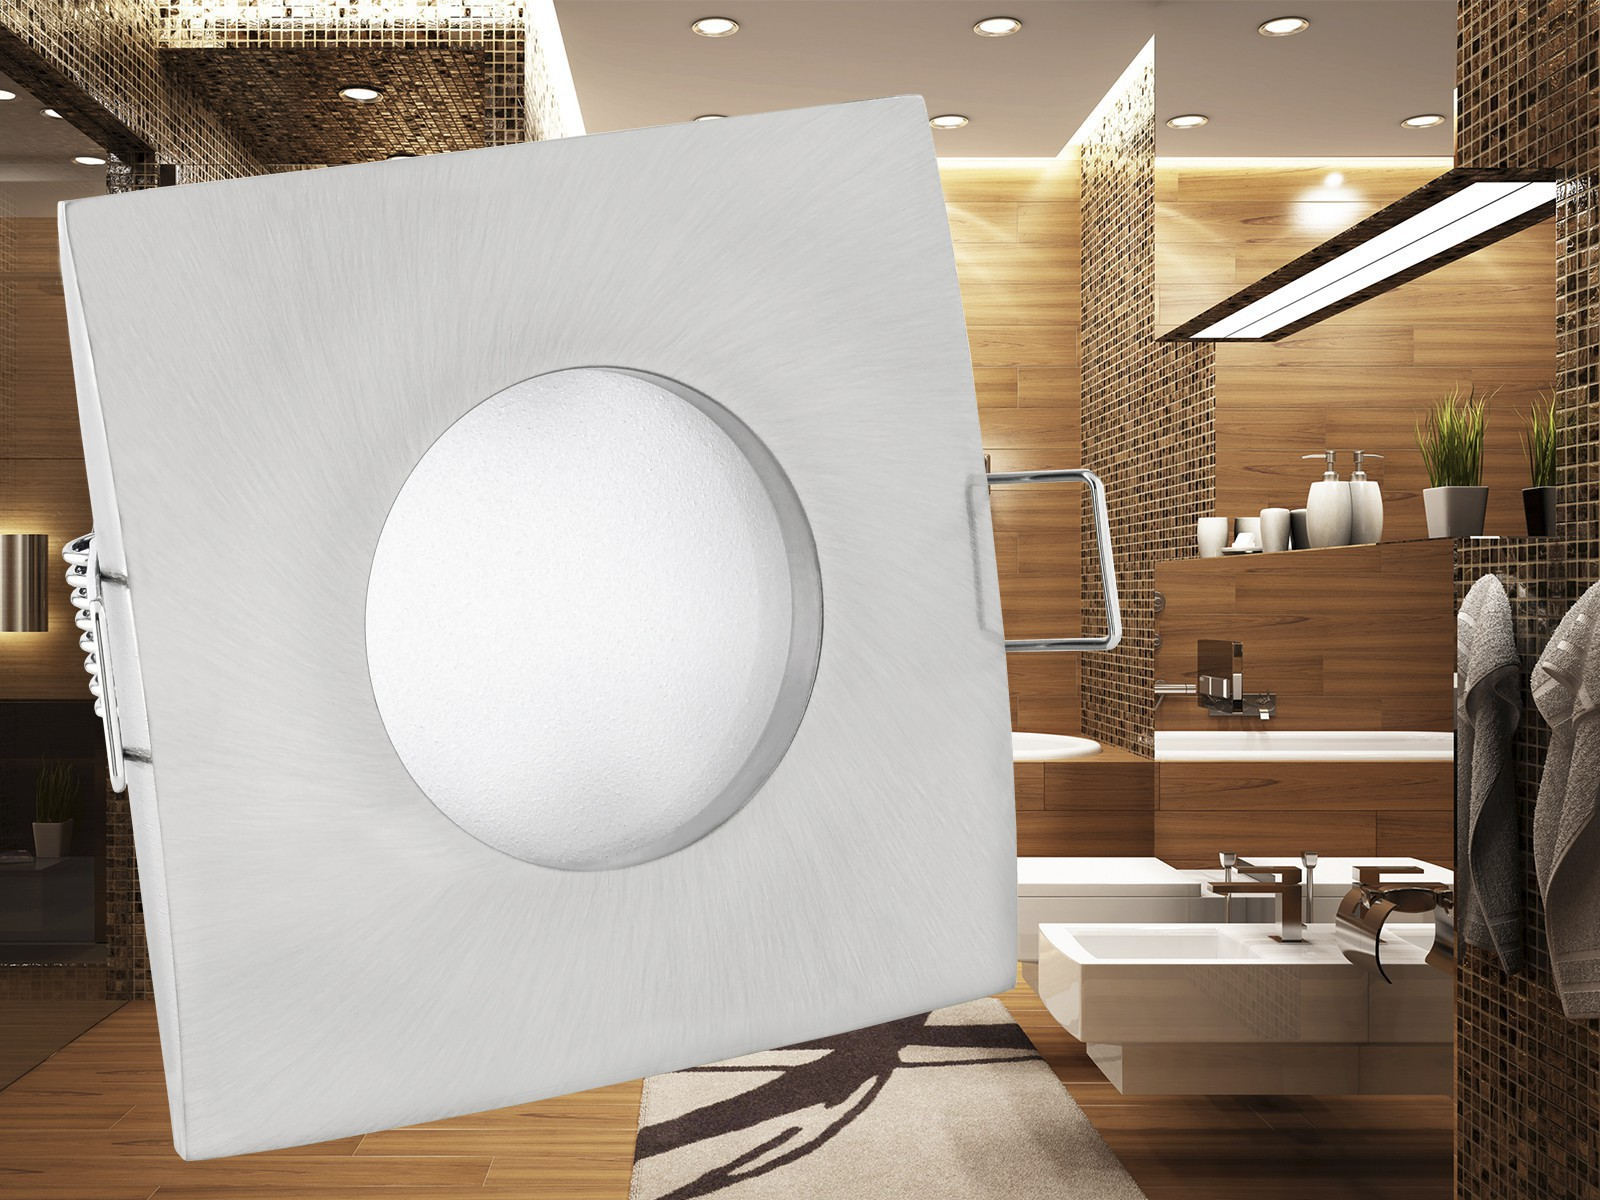 QW-1-alu-shop-1-1600x1200 Fabelhafte Feuchtraum Led Einbaustrahler 230v Dekorationen